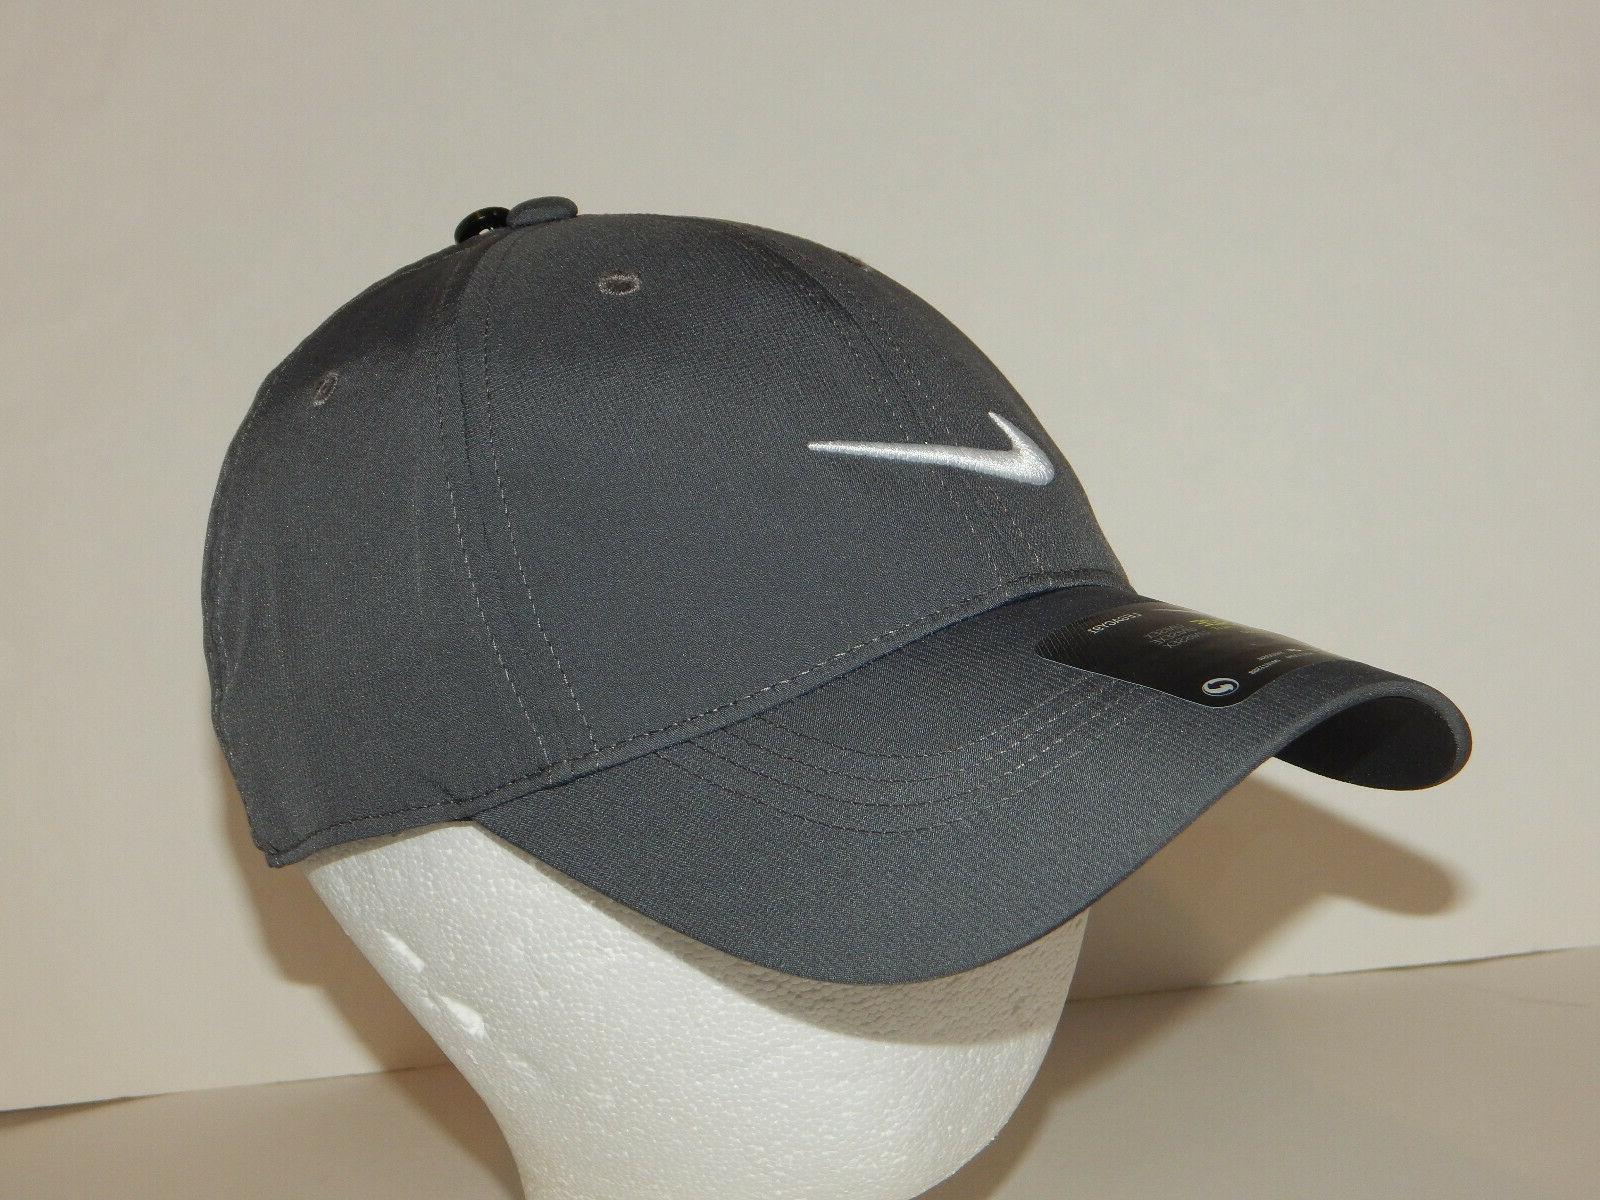 Nike Unisex / Adult Golf Running or Grey